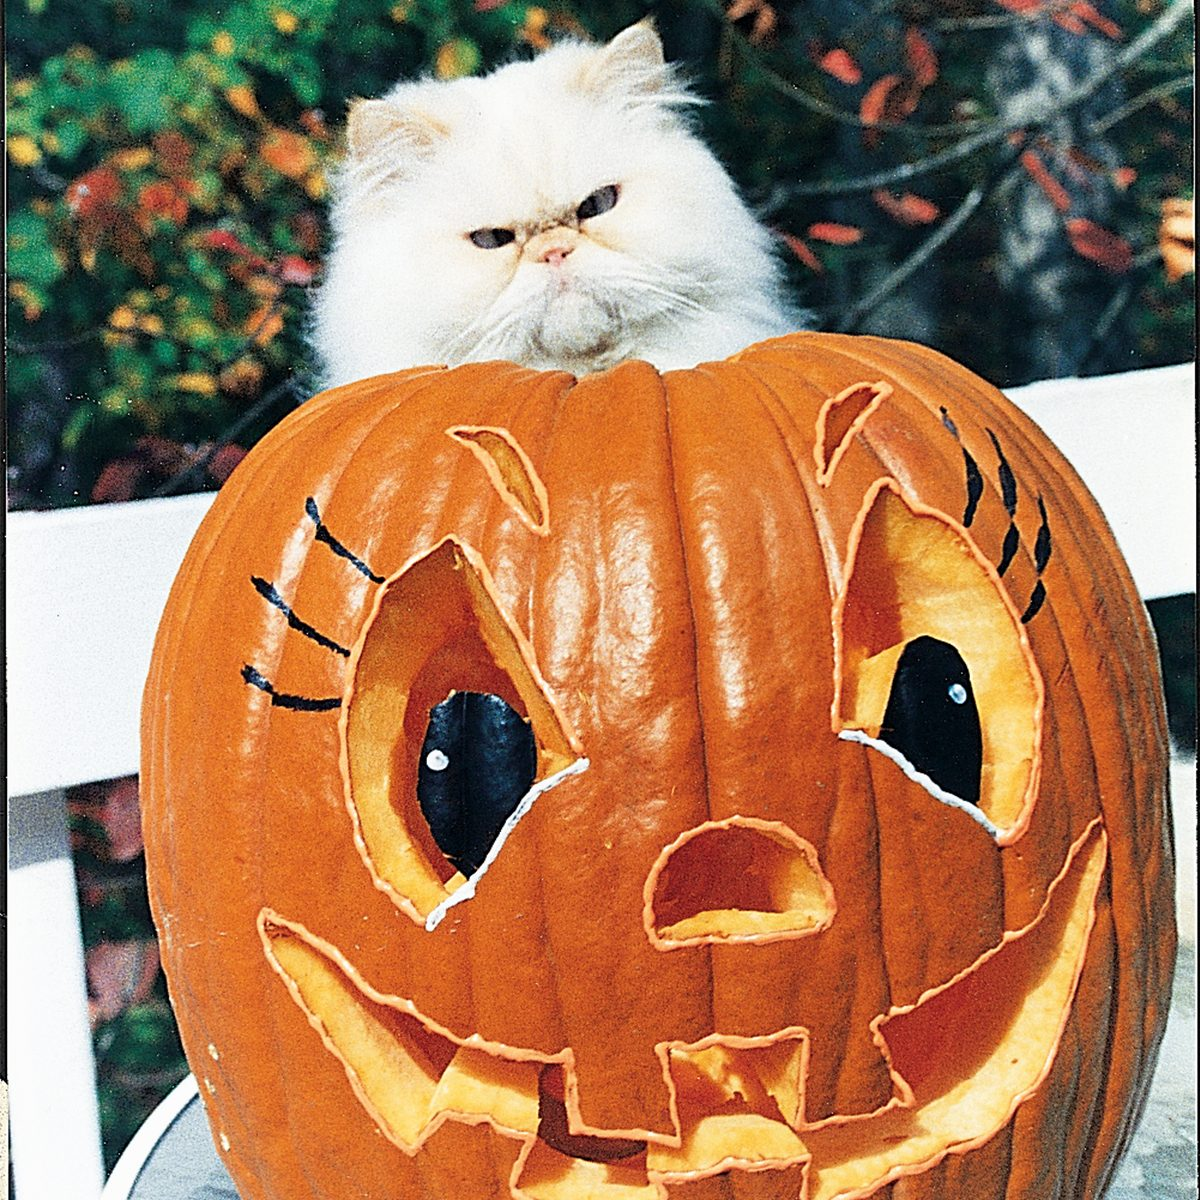 cat sitting on a jack-o-lantern pumpkin Halloween /COU Magazine/1994/October-November-1994_1586/2425-4445_HiRes